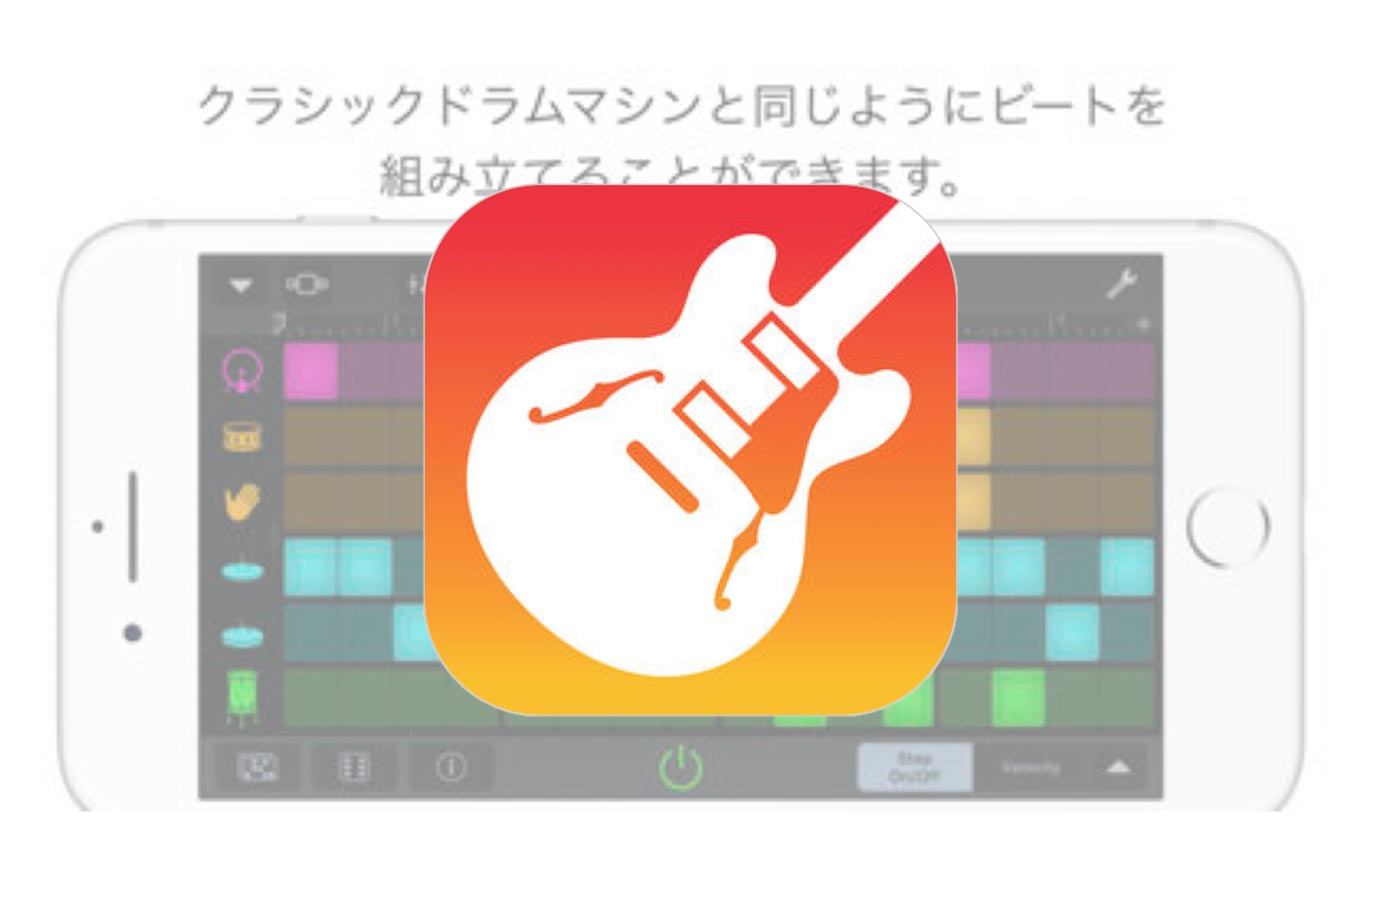 Apple、iOSアプリ「GarageBand 2.3.2」リリース ― 安定性の向上および問題を修正